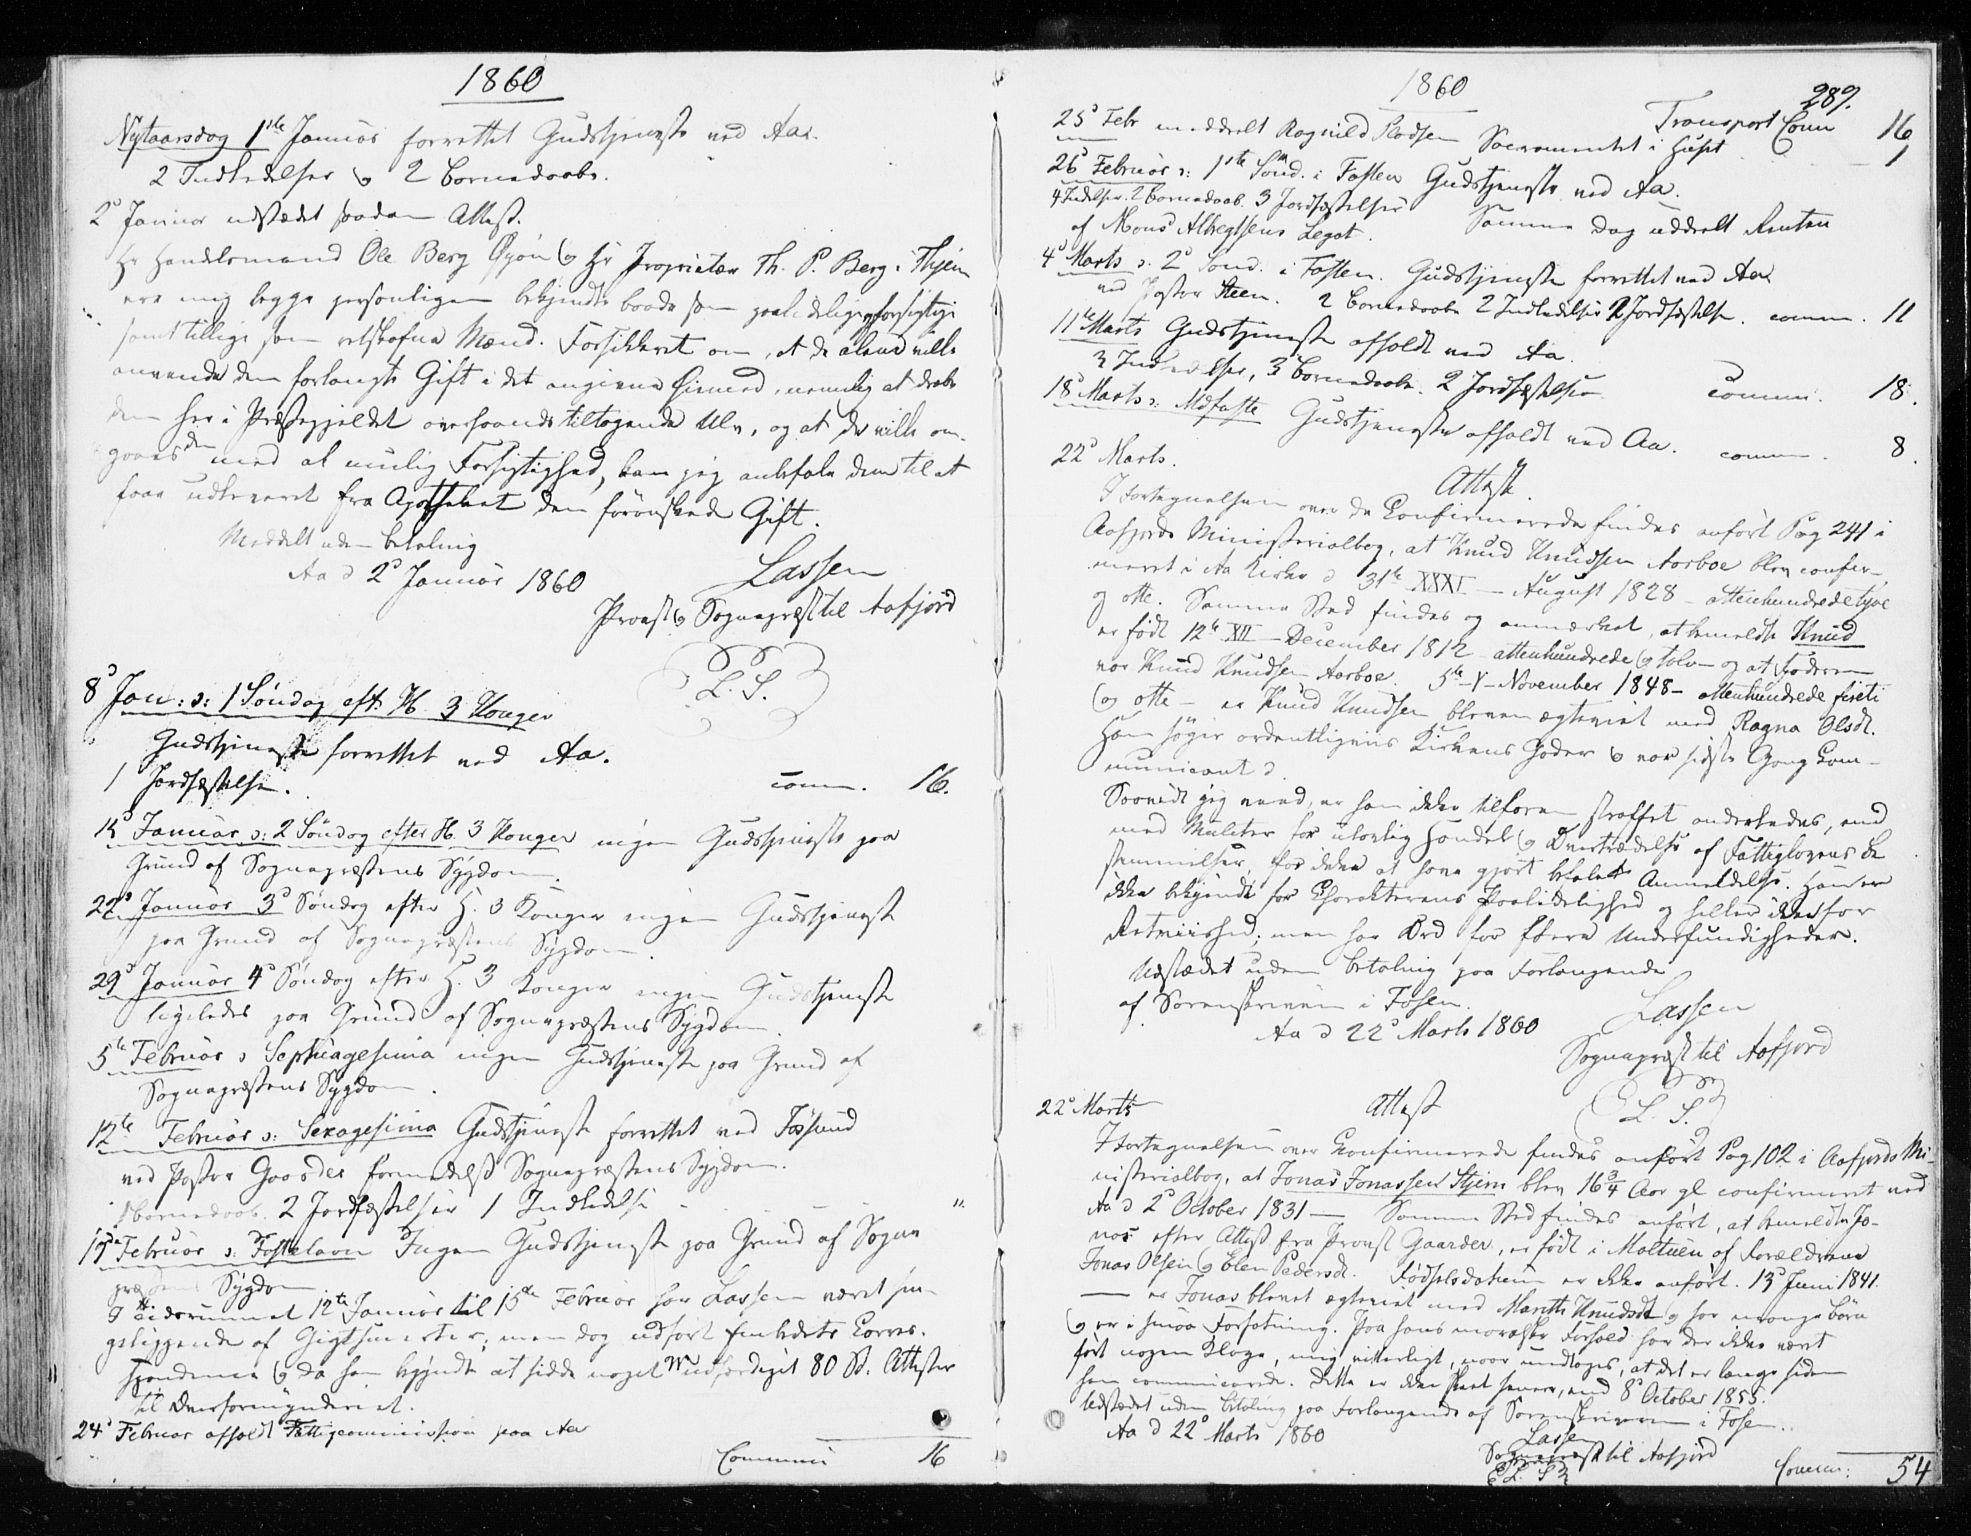 SAT, Ministerialprotokoller, klokkerbøker og fødselsregistre - Sør-Trøndelag, 655/L0677: Parish register (official) no. 655A06, 1847-1860, p. 289